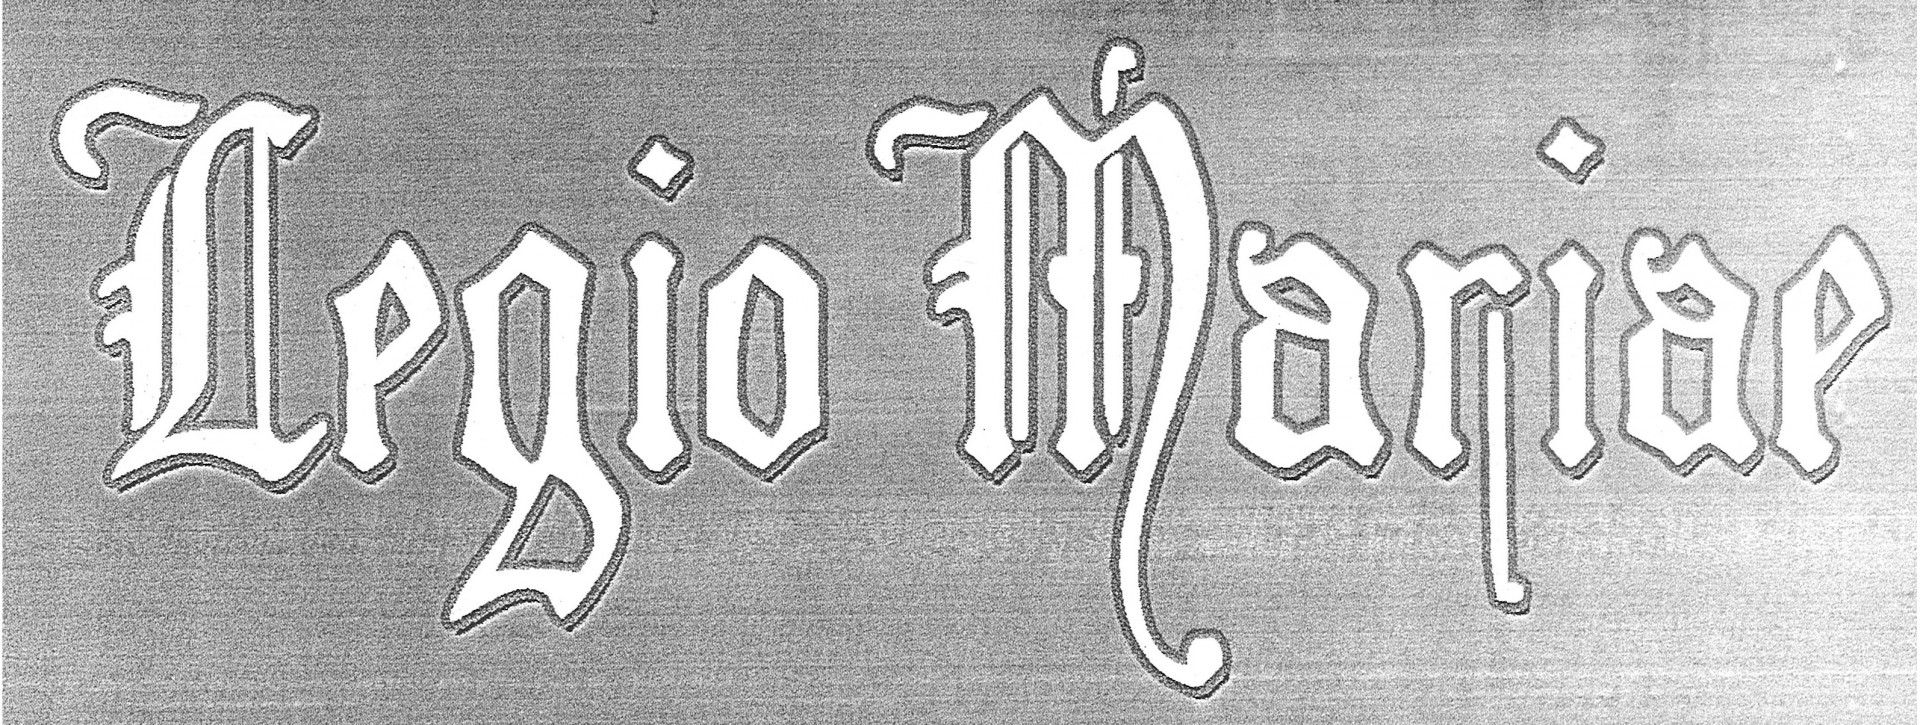 Marijos Legiono jubiliejus